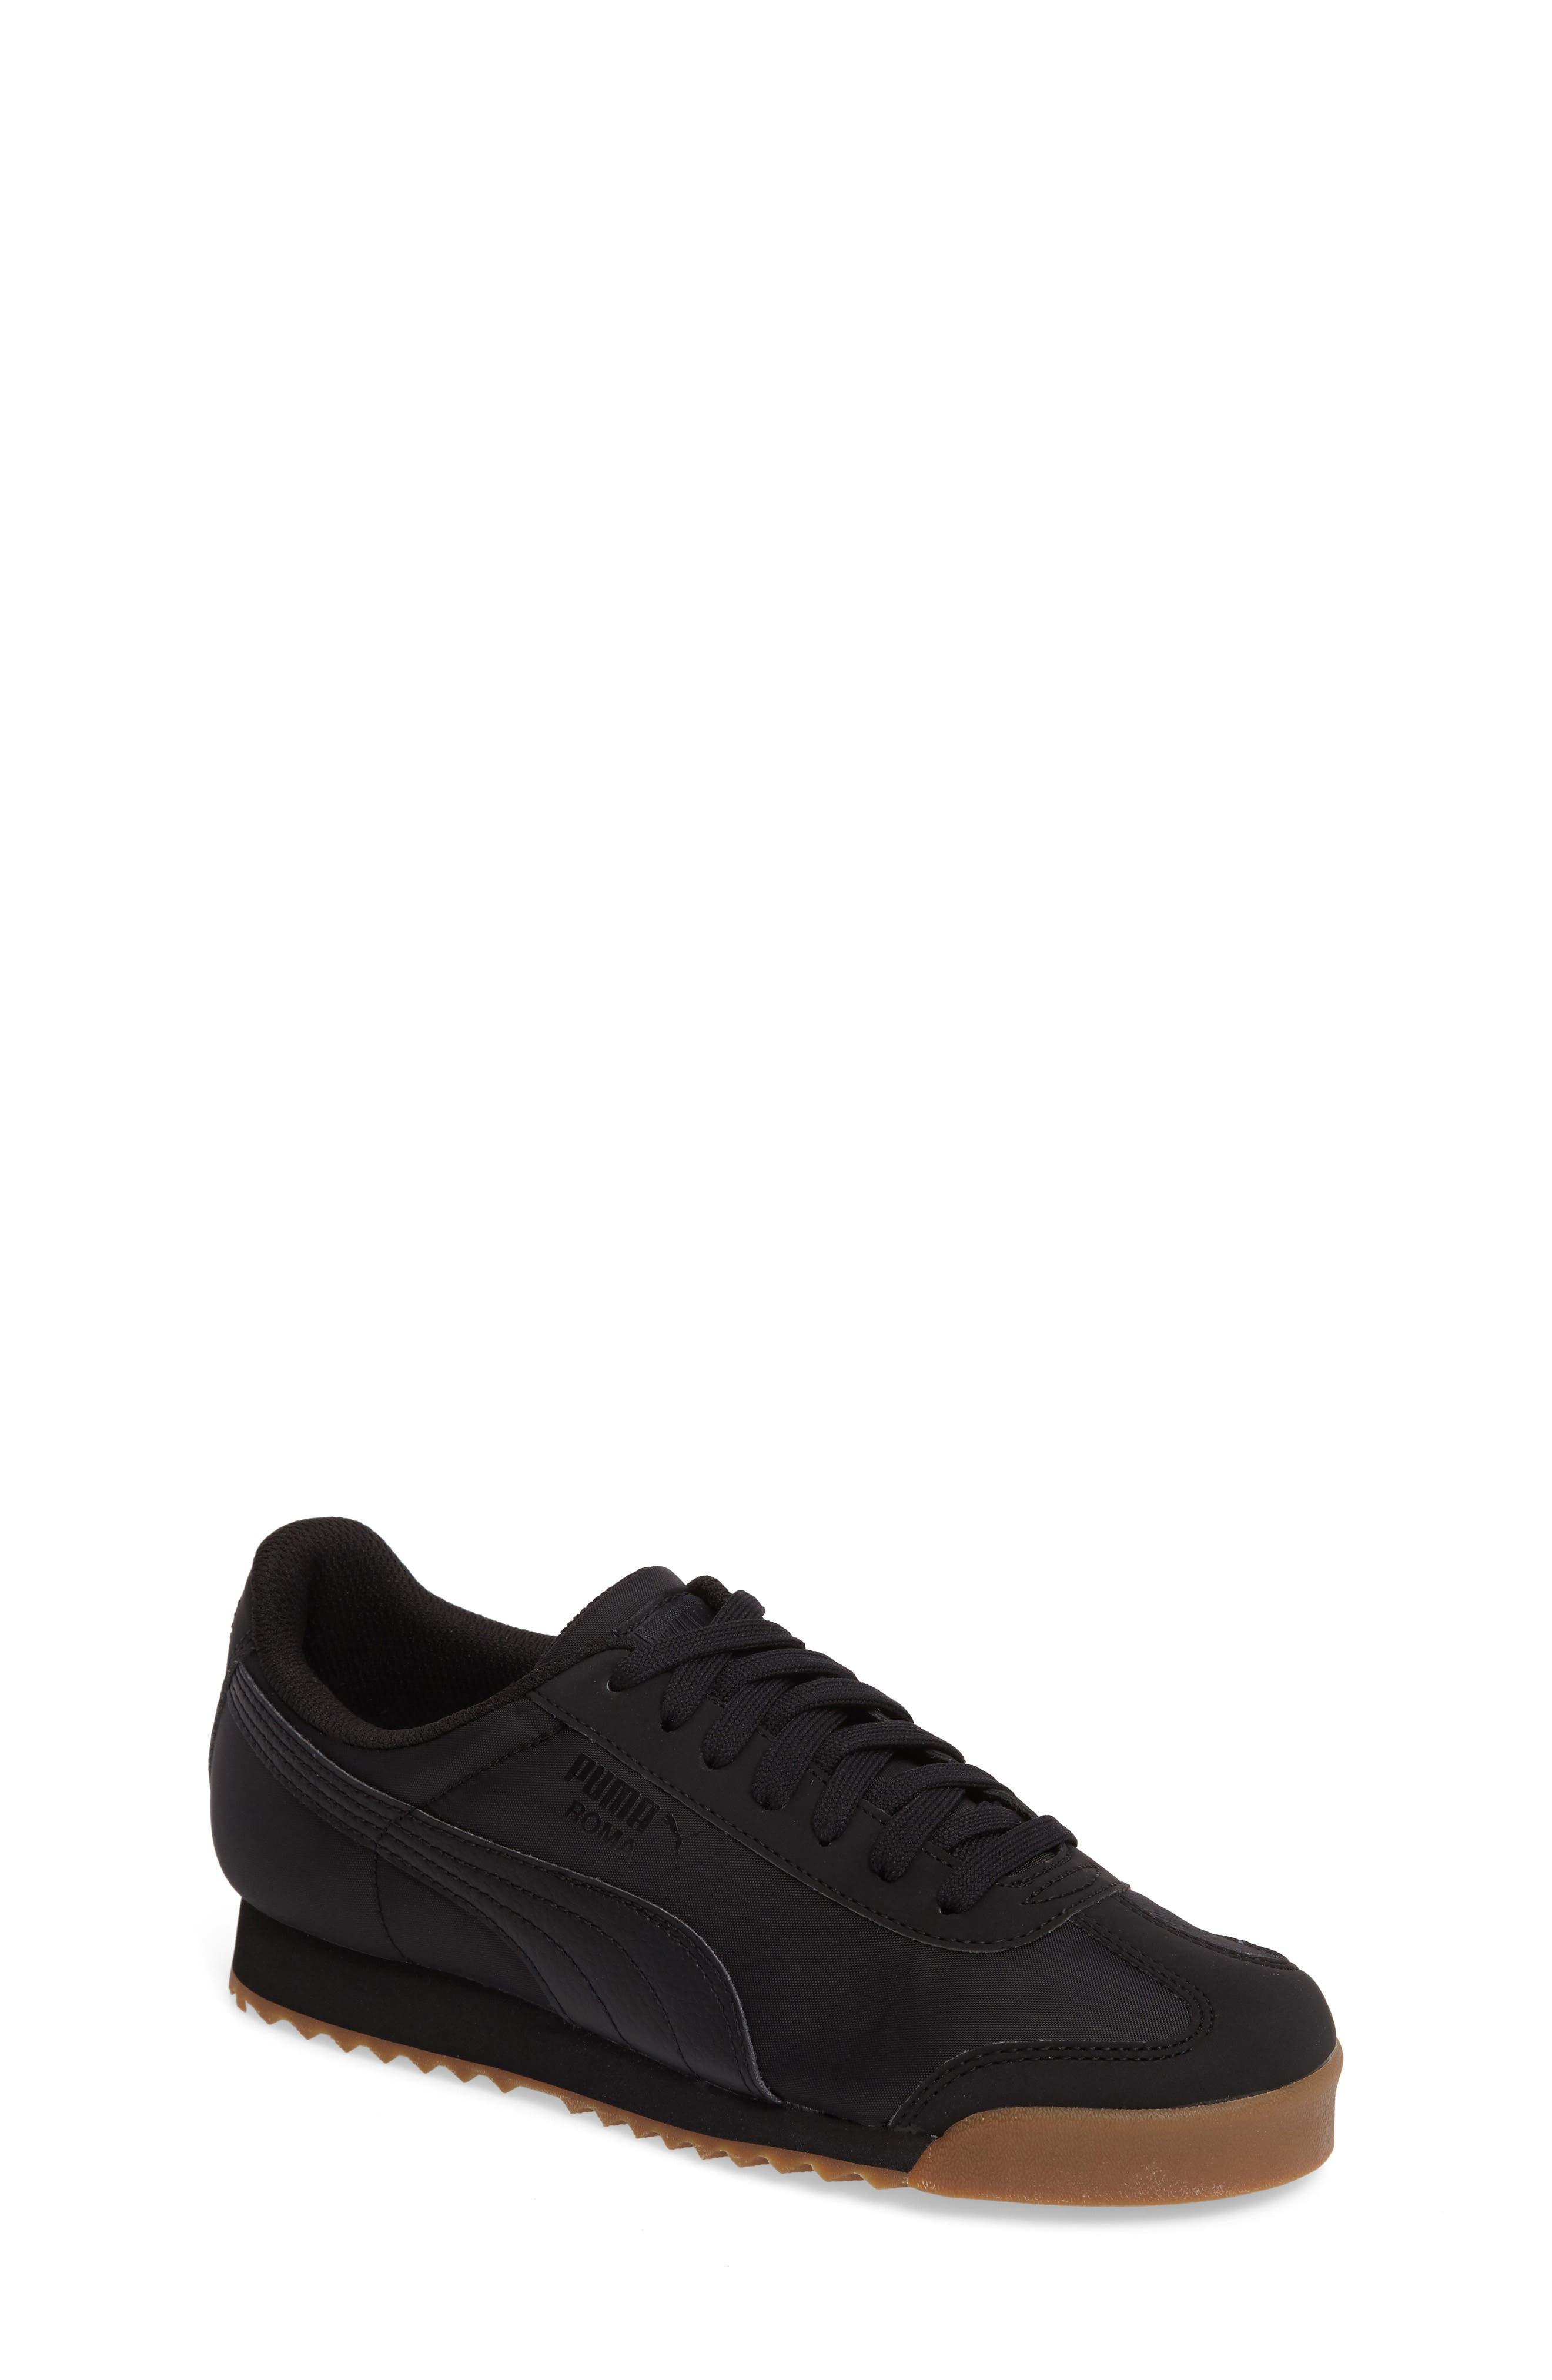 Roma Basic Summer Sneaker,                         Main,                         color, 001